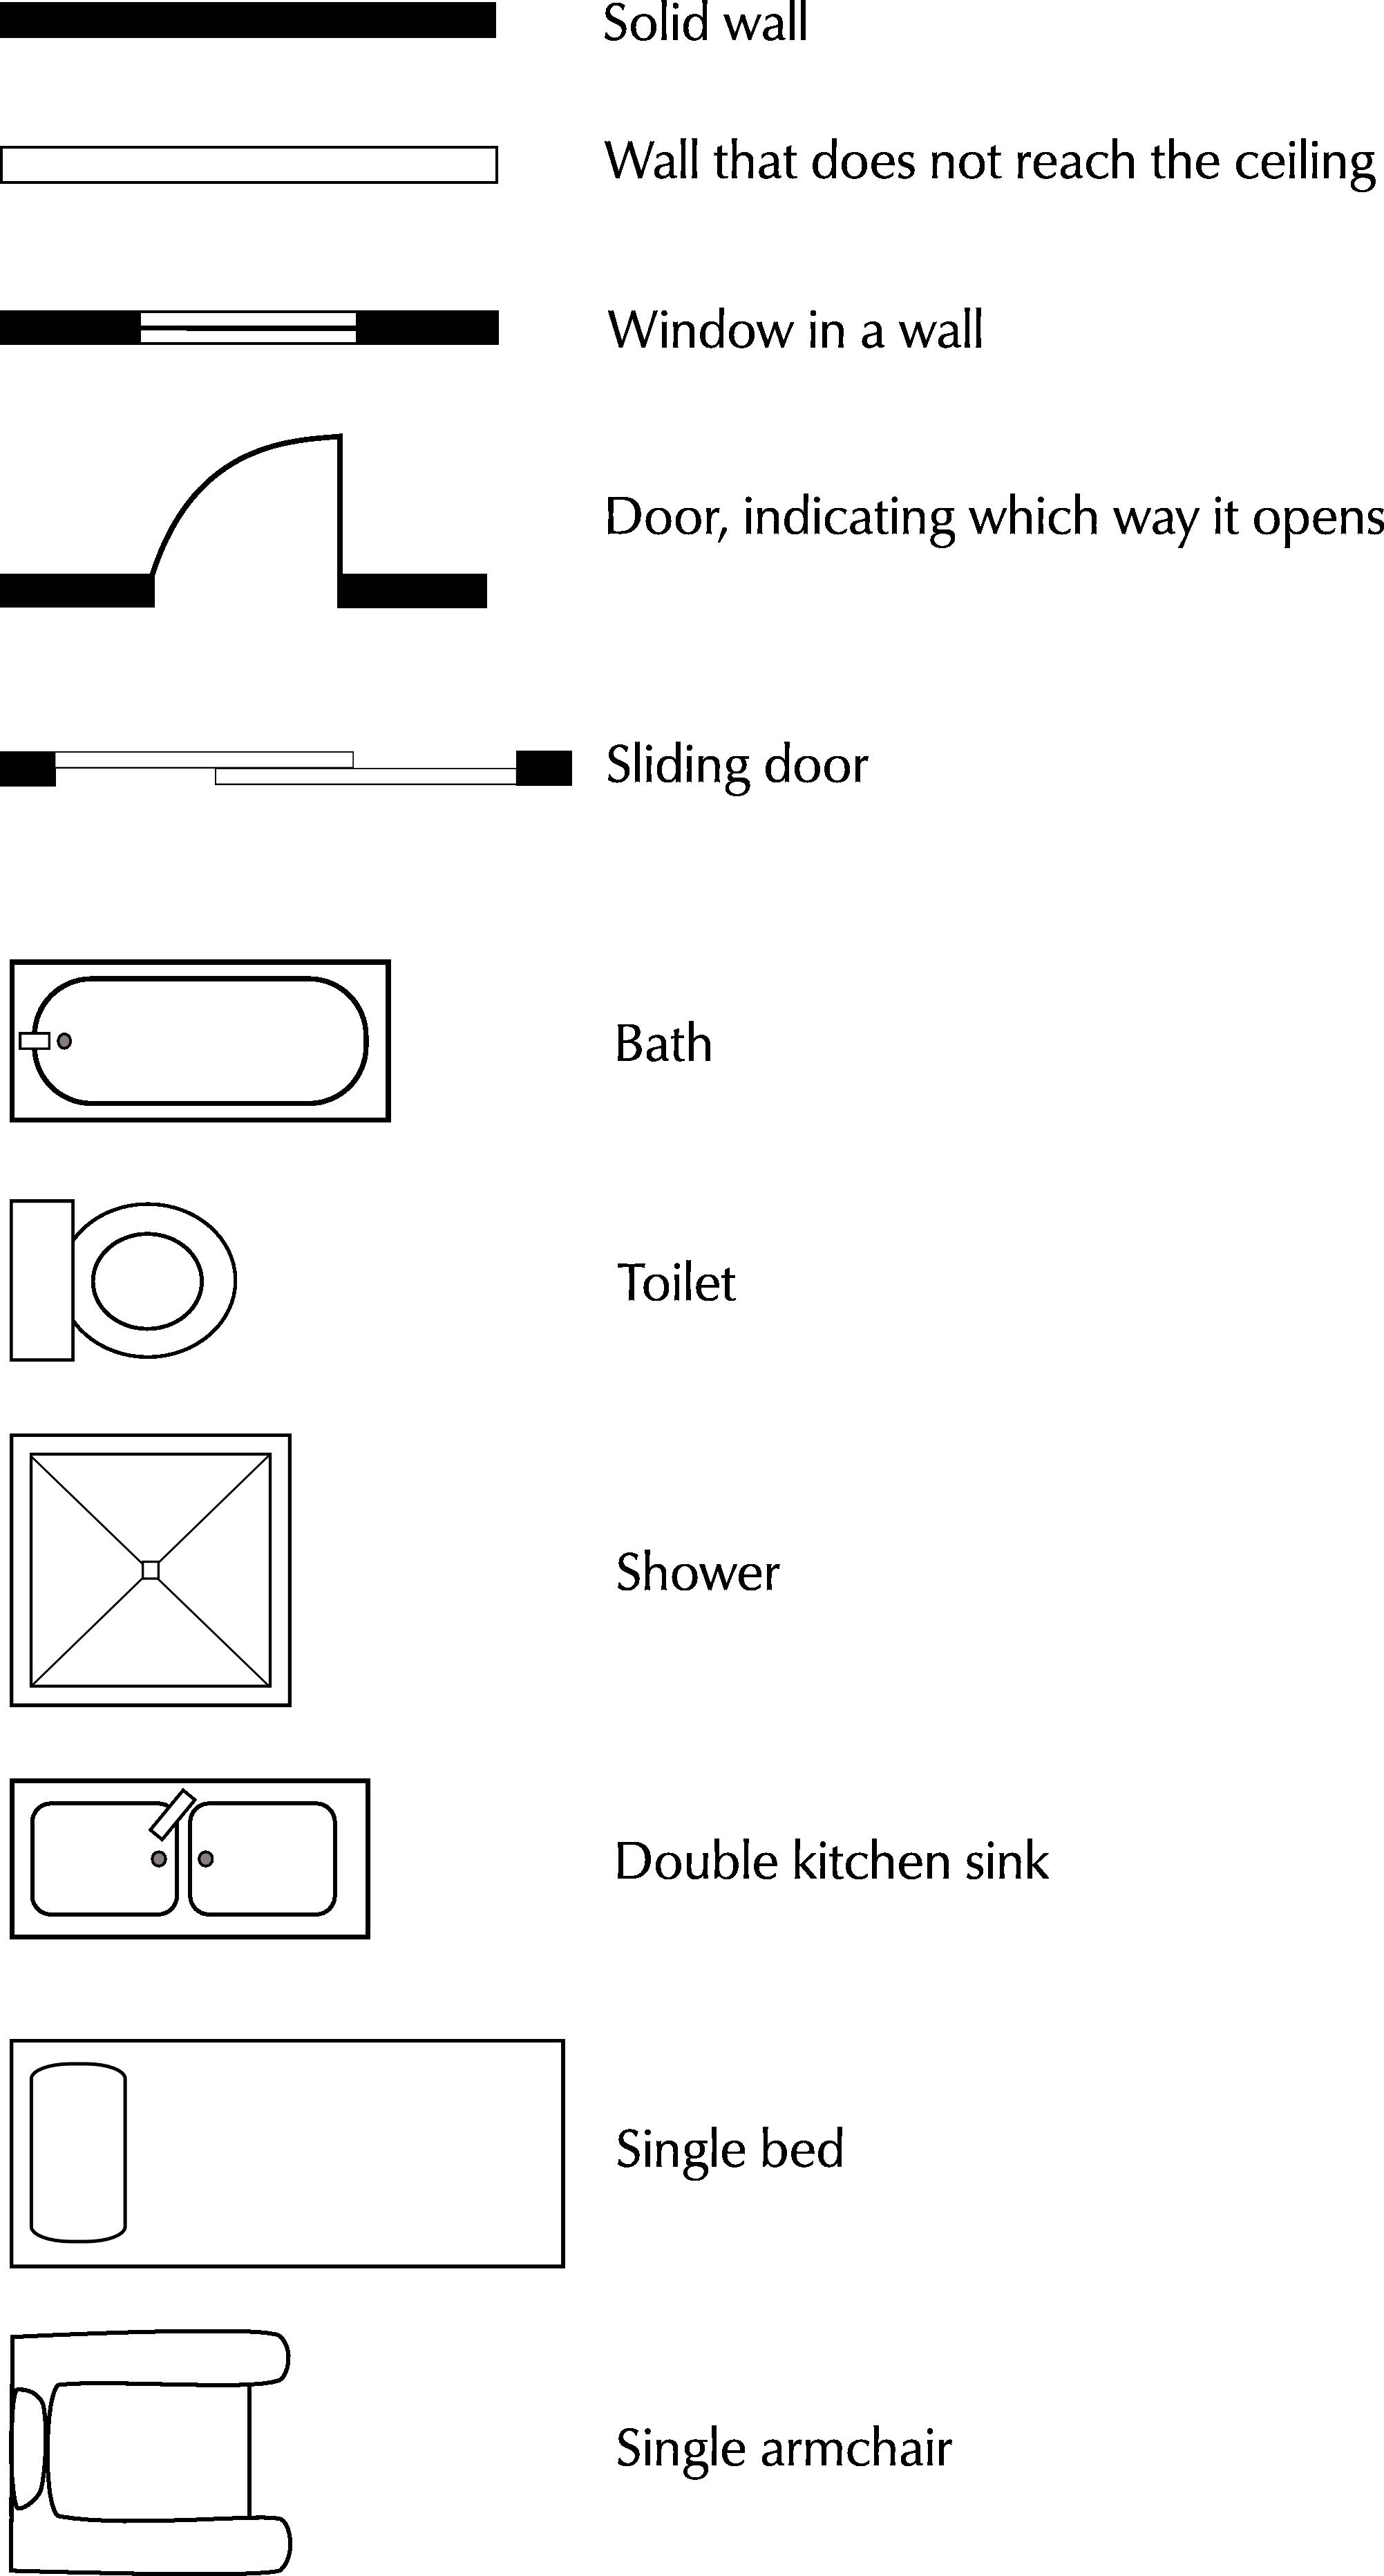 Floor Plans Assembly Diagrams Floor Plans And Packaging Siyavula In 2020 Floor Plan Symbols Interior Design Plan How To Plan